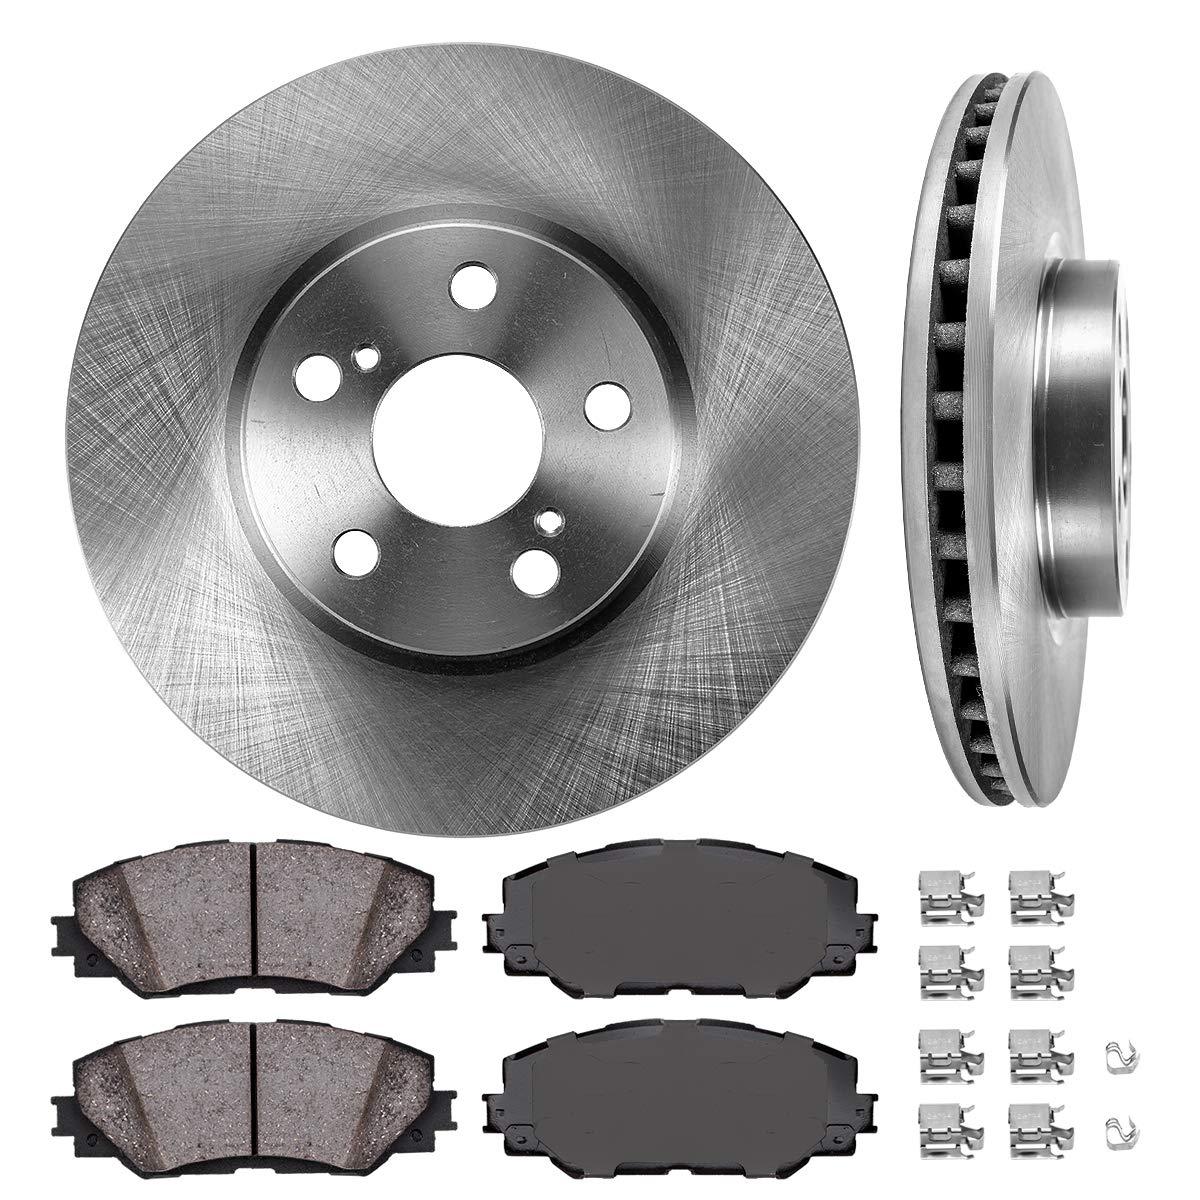 Brake Disc Rotors + Ceramic Brake Pads Clips FRONT 275 mm Premium OE 5 Lug 2 4